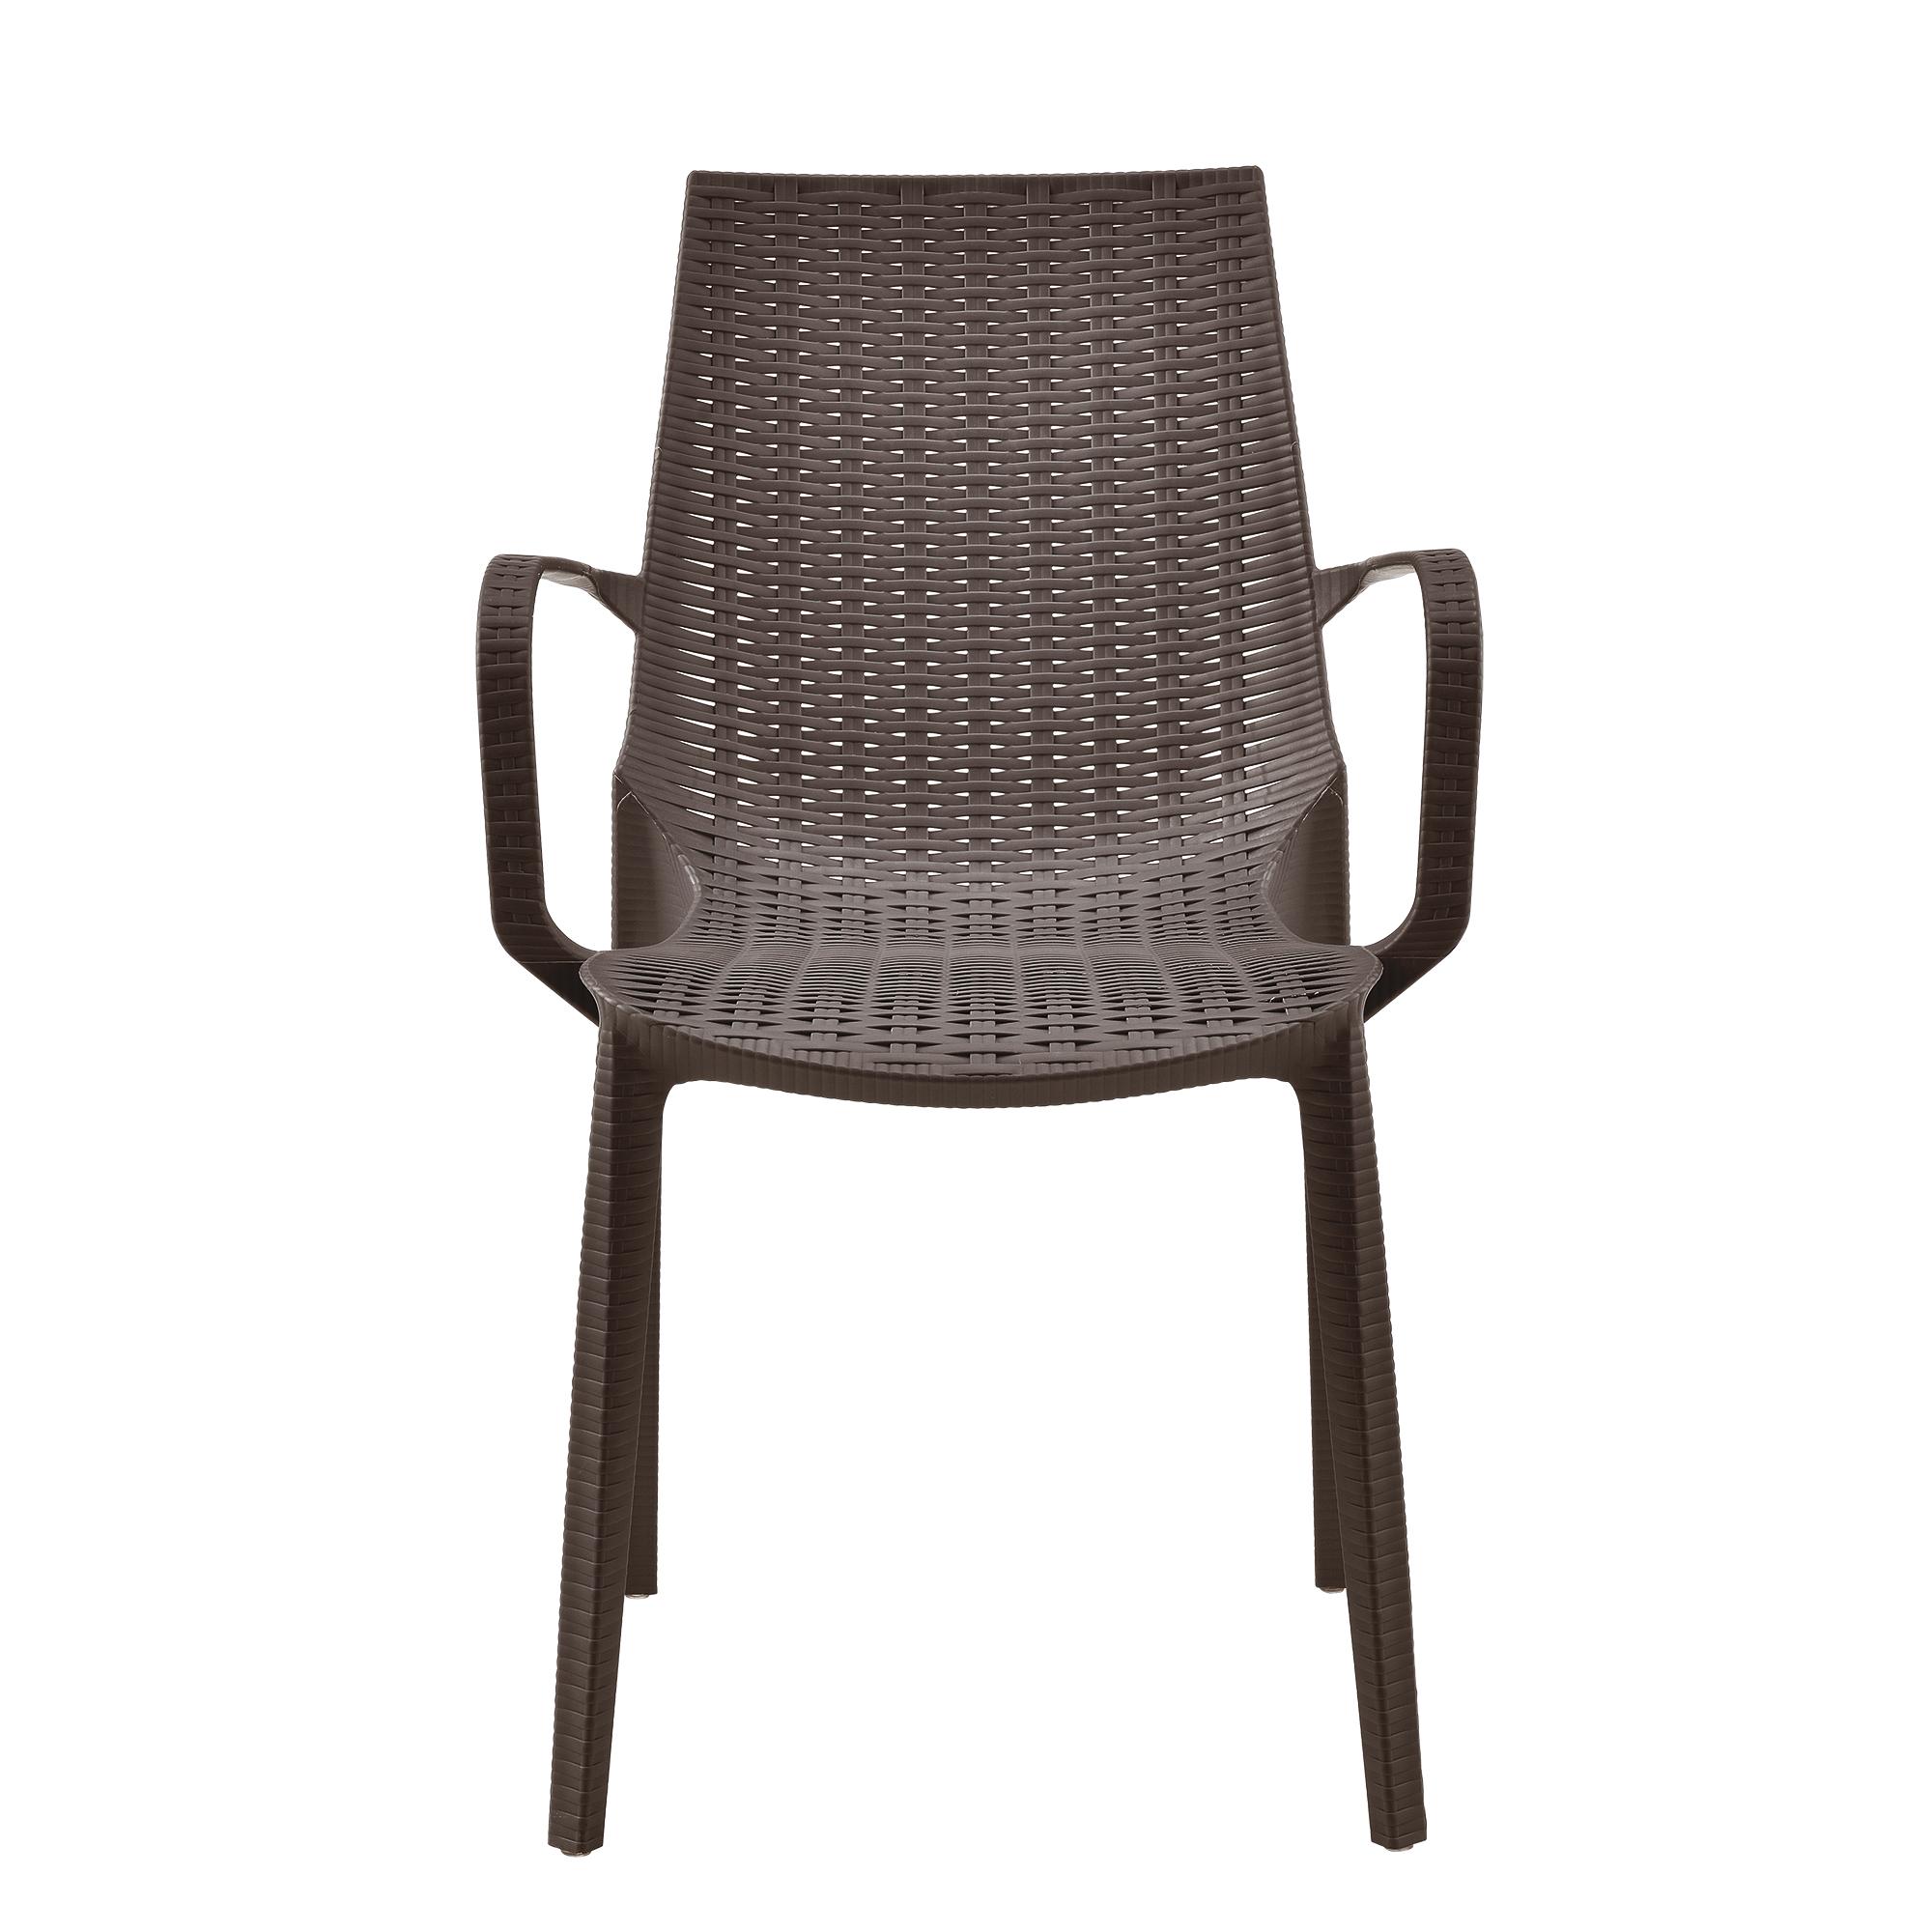 2x gartenstuhl 89x54 5x55cm braun rattan optik lehne polyrattan stuhl ebay. Black Bedroom Furniture Sets. Home Design Ideas